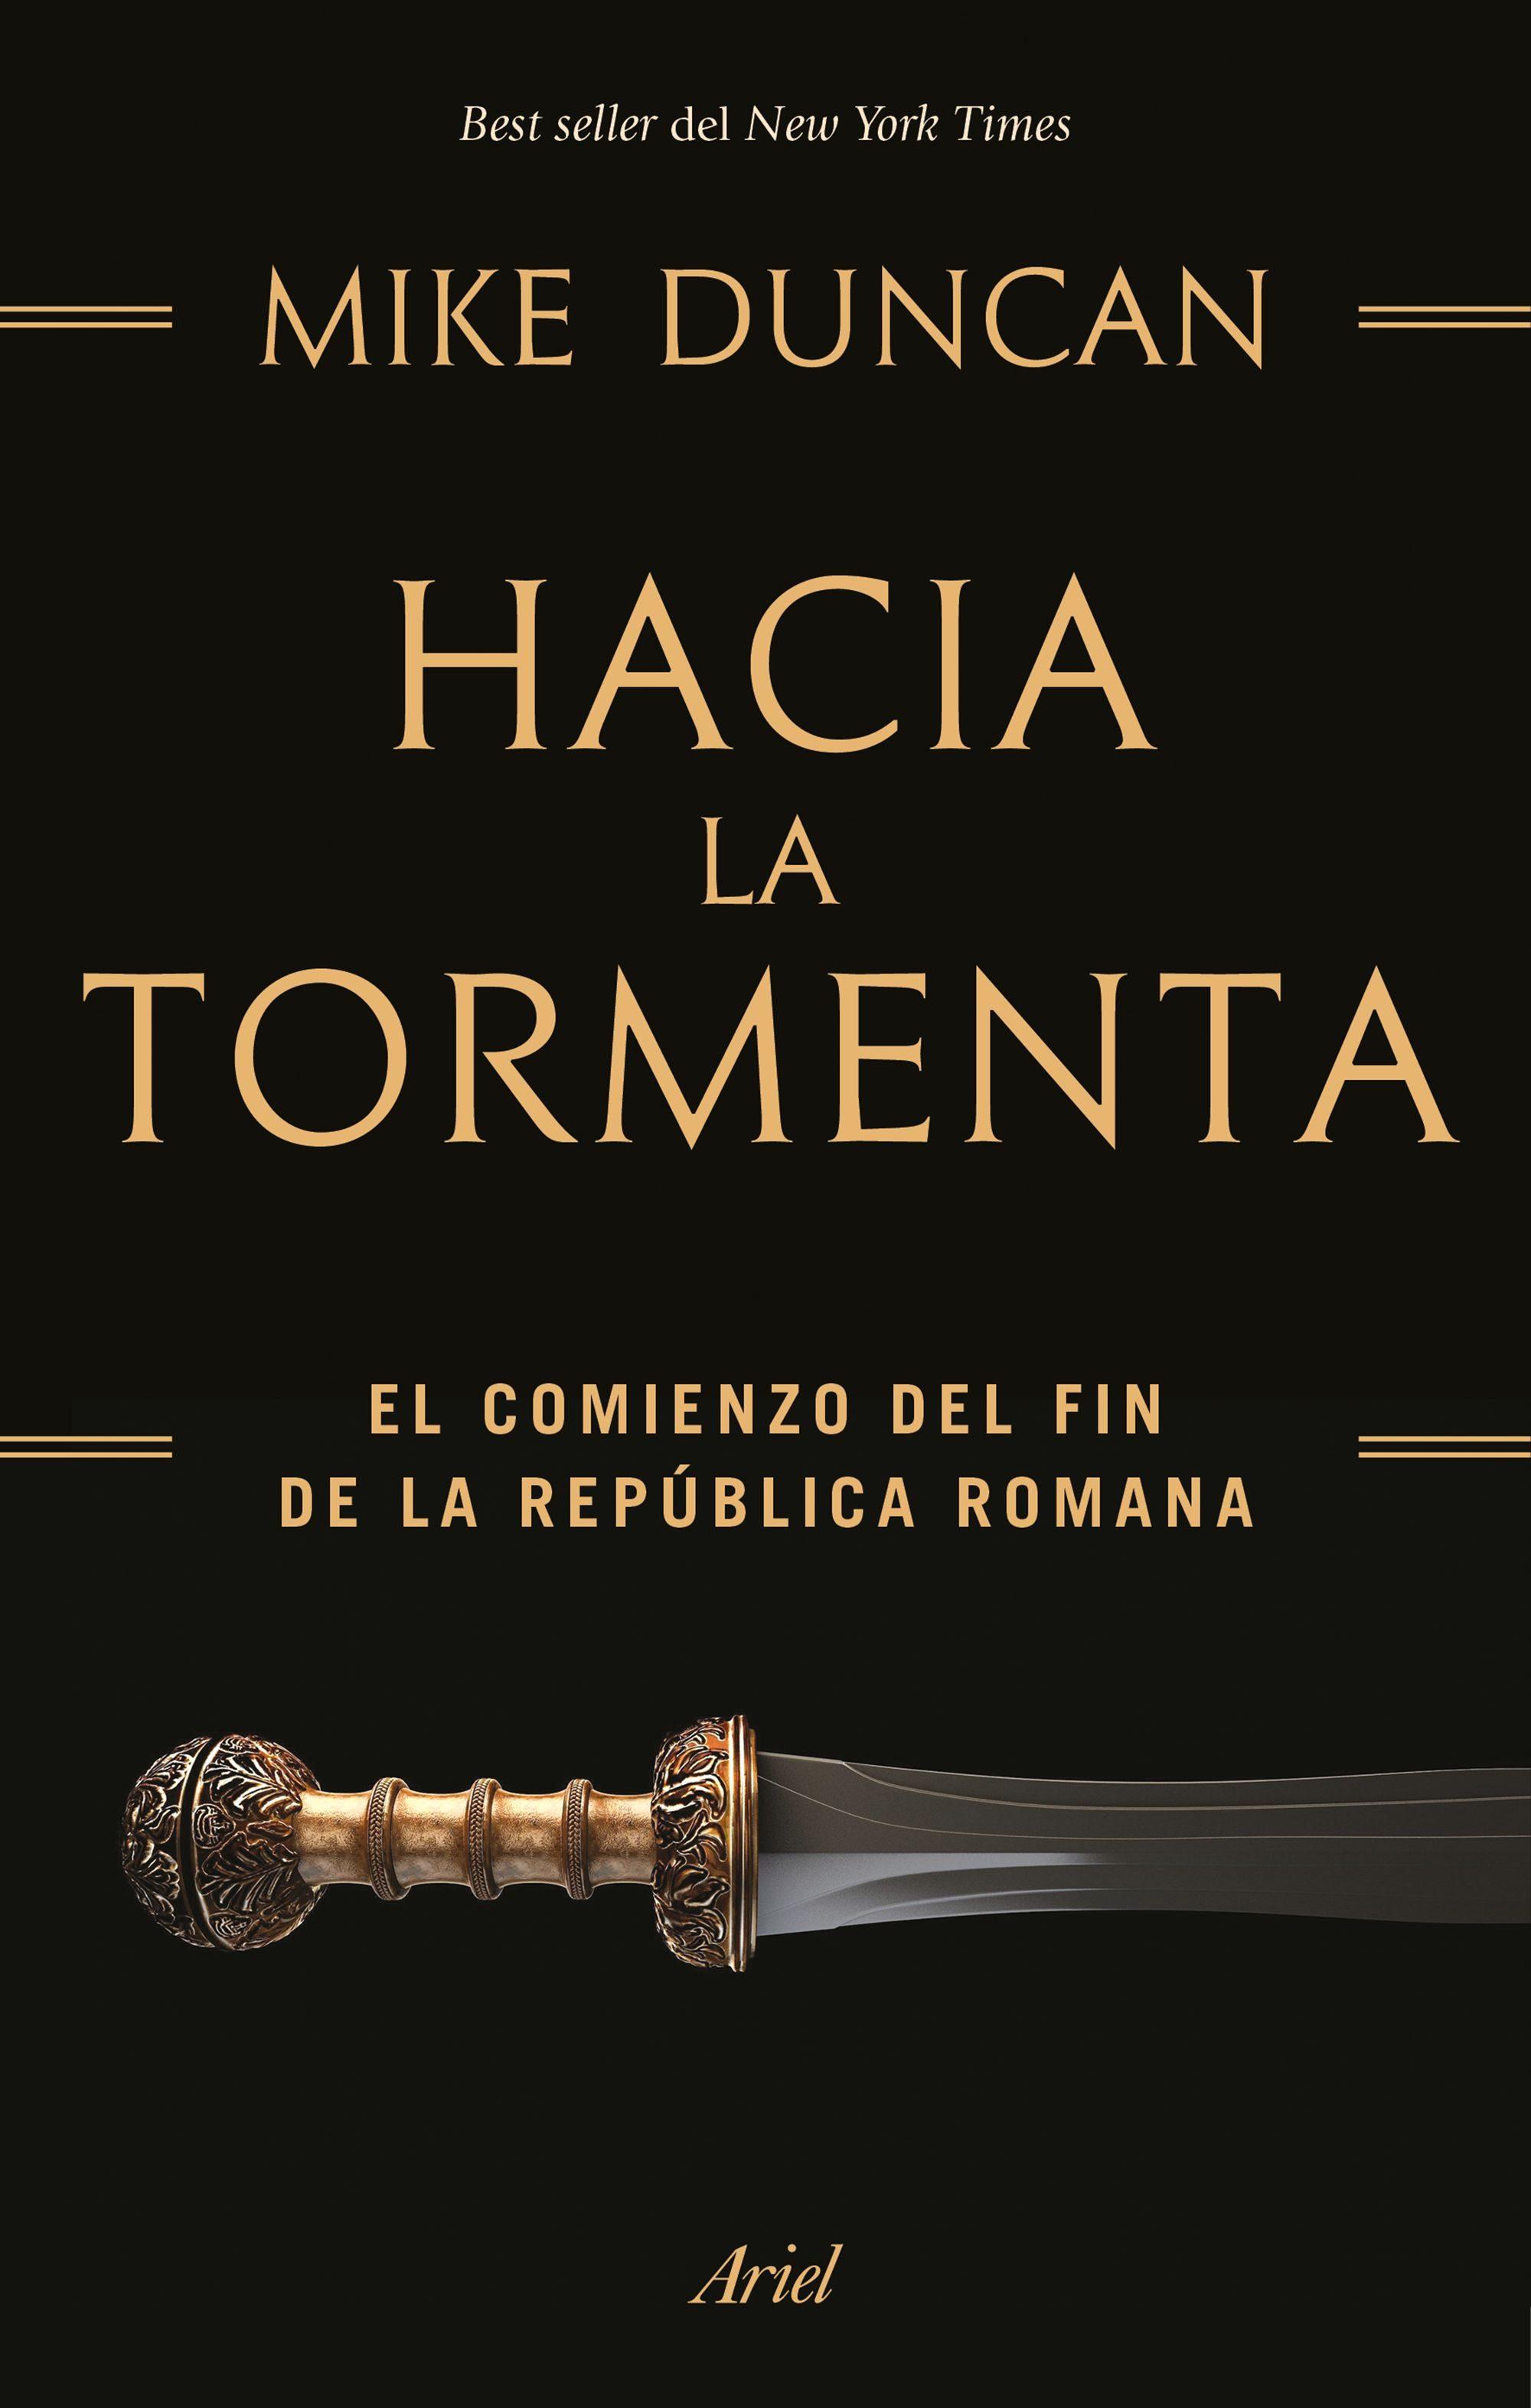 Hacia La Tormenta: El Comienzo Del Fin De La Republica Romana por Mike Duncan